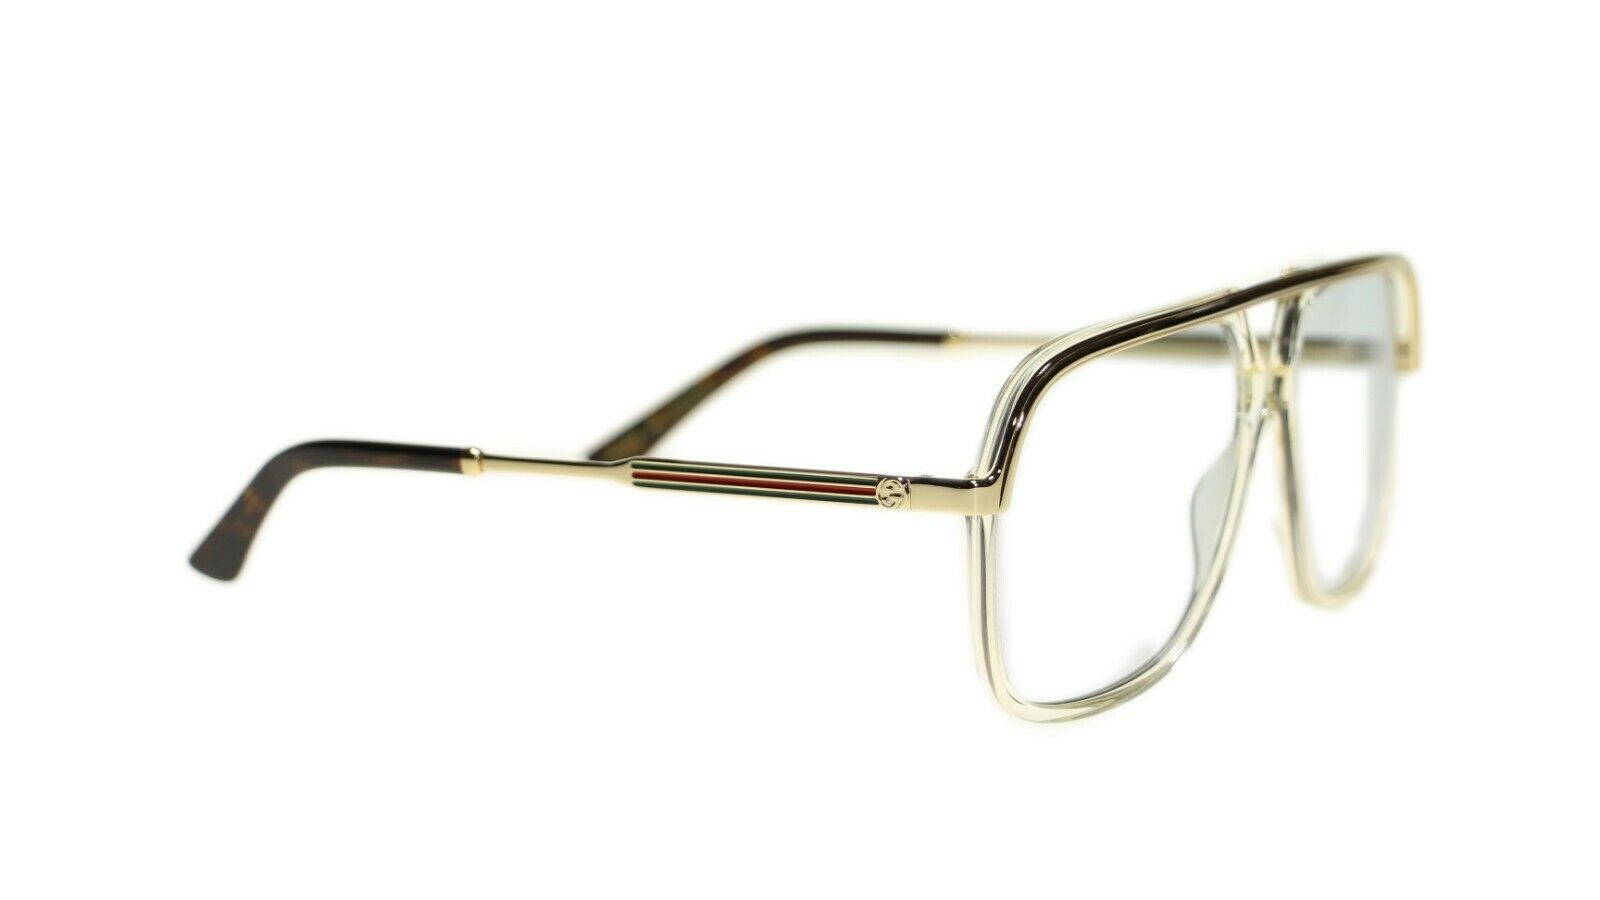 Gucci Unisex Sunglasses GG0200 005 Yellow Gold Light Blue Lens 57mm Authentic